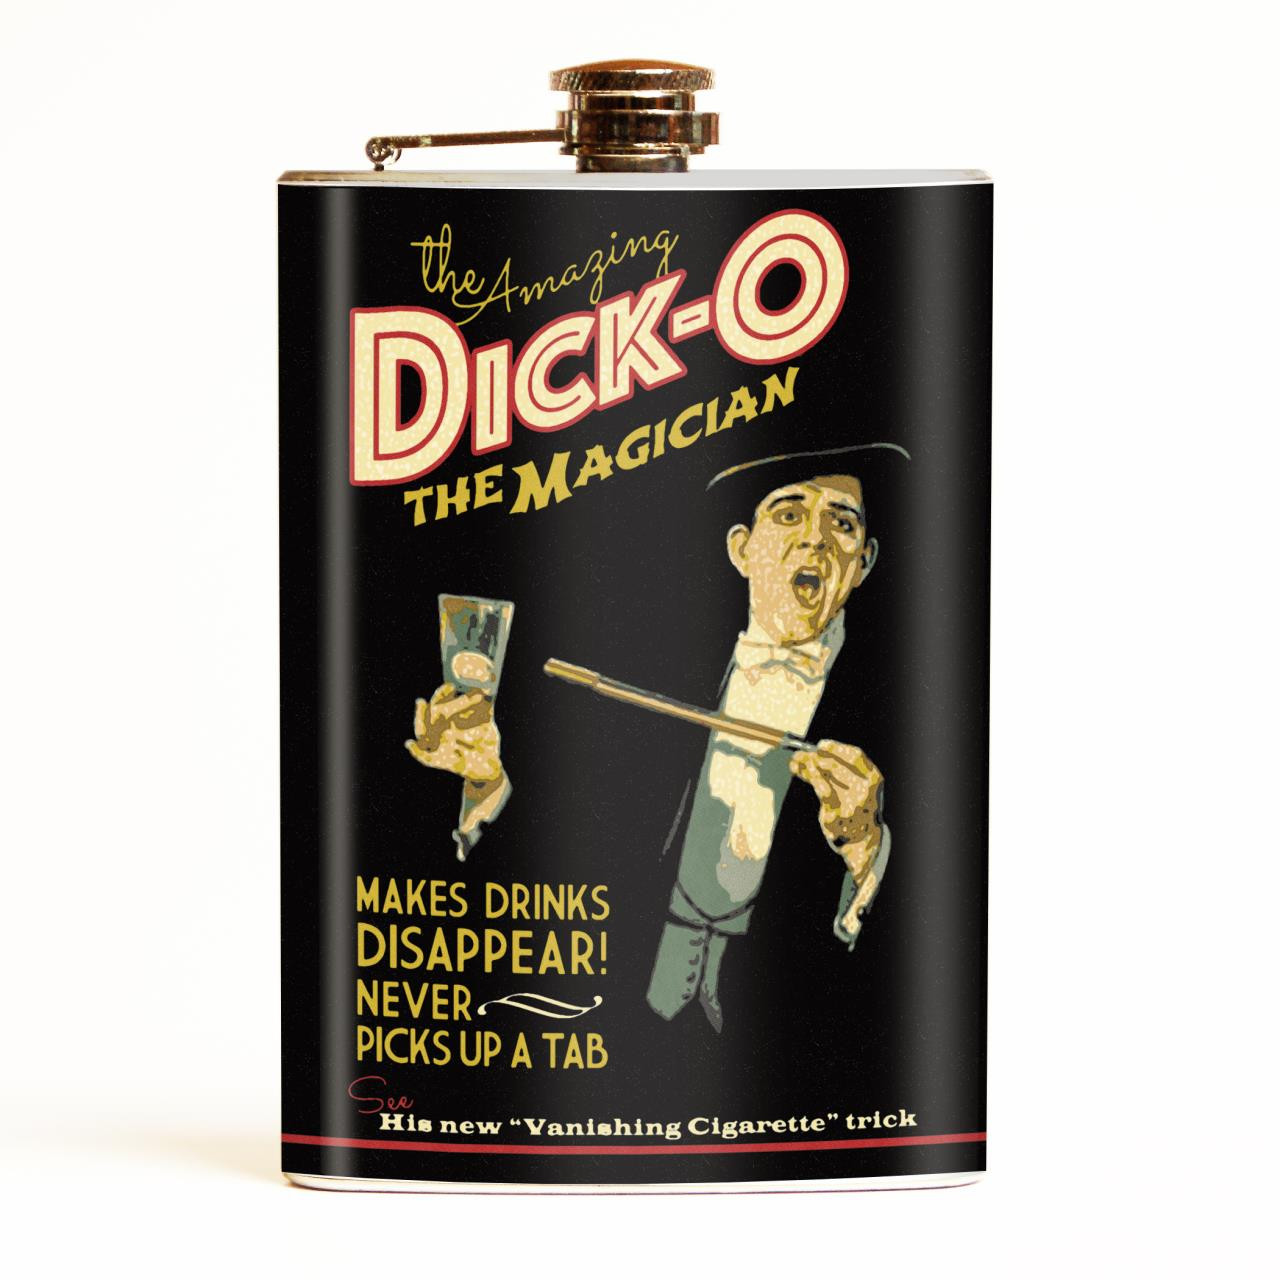 Dick-O The Magician Flask* -